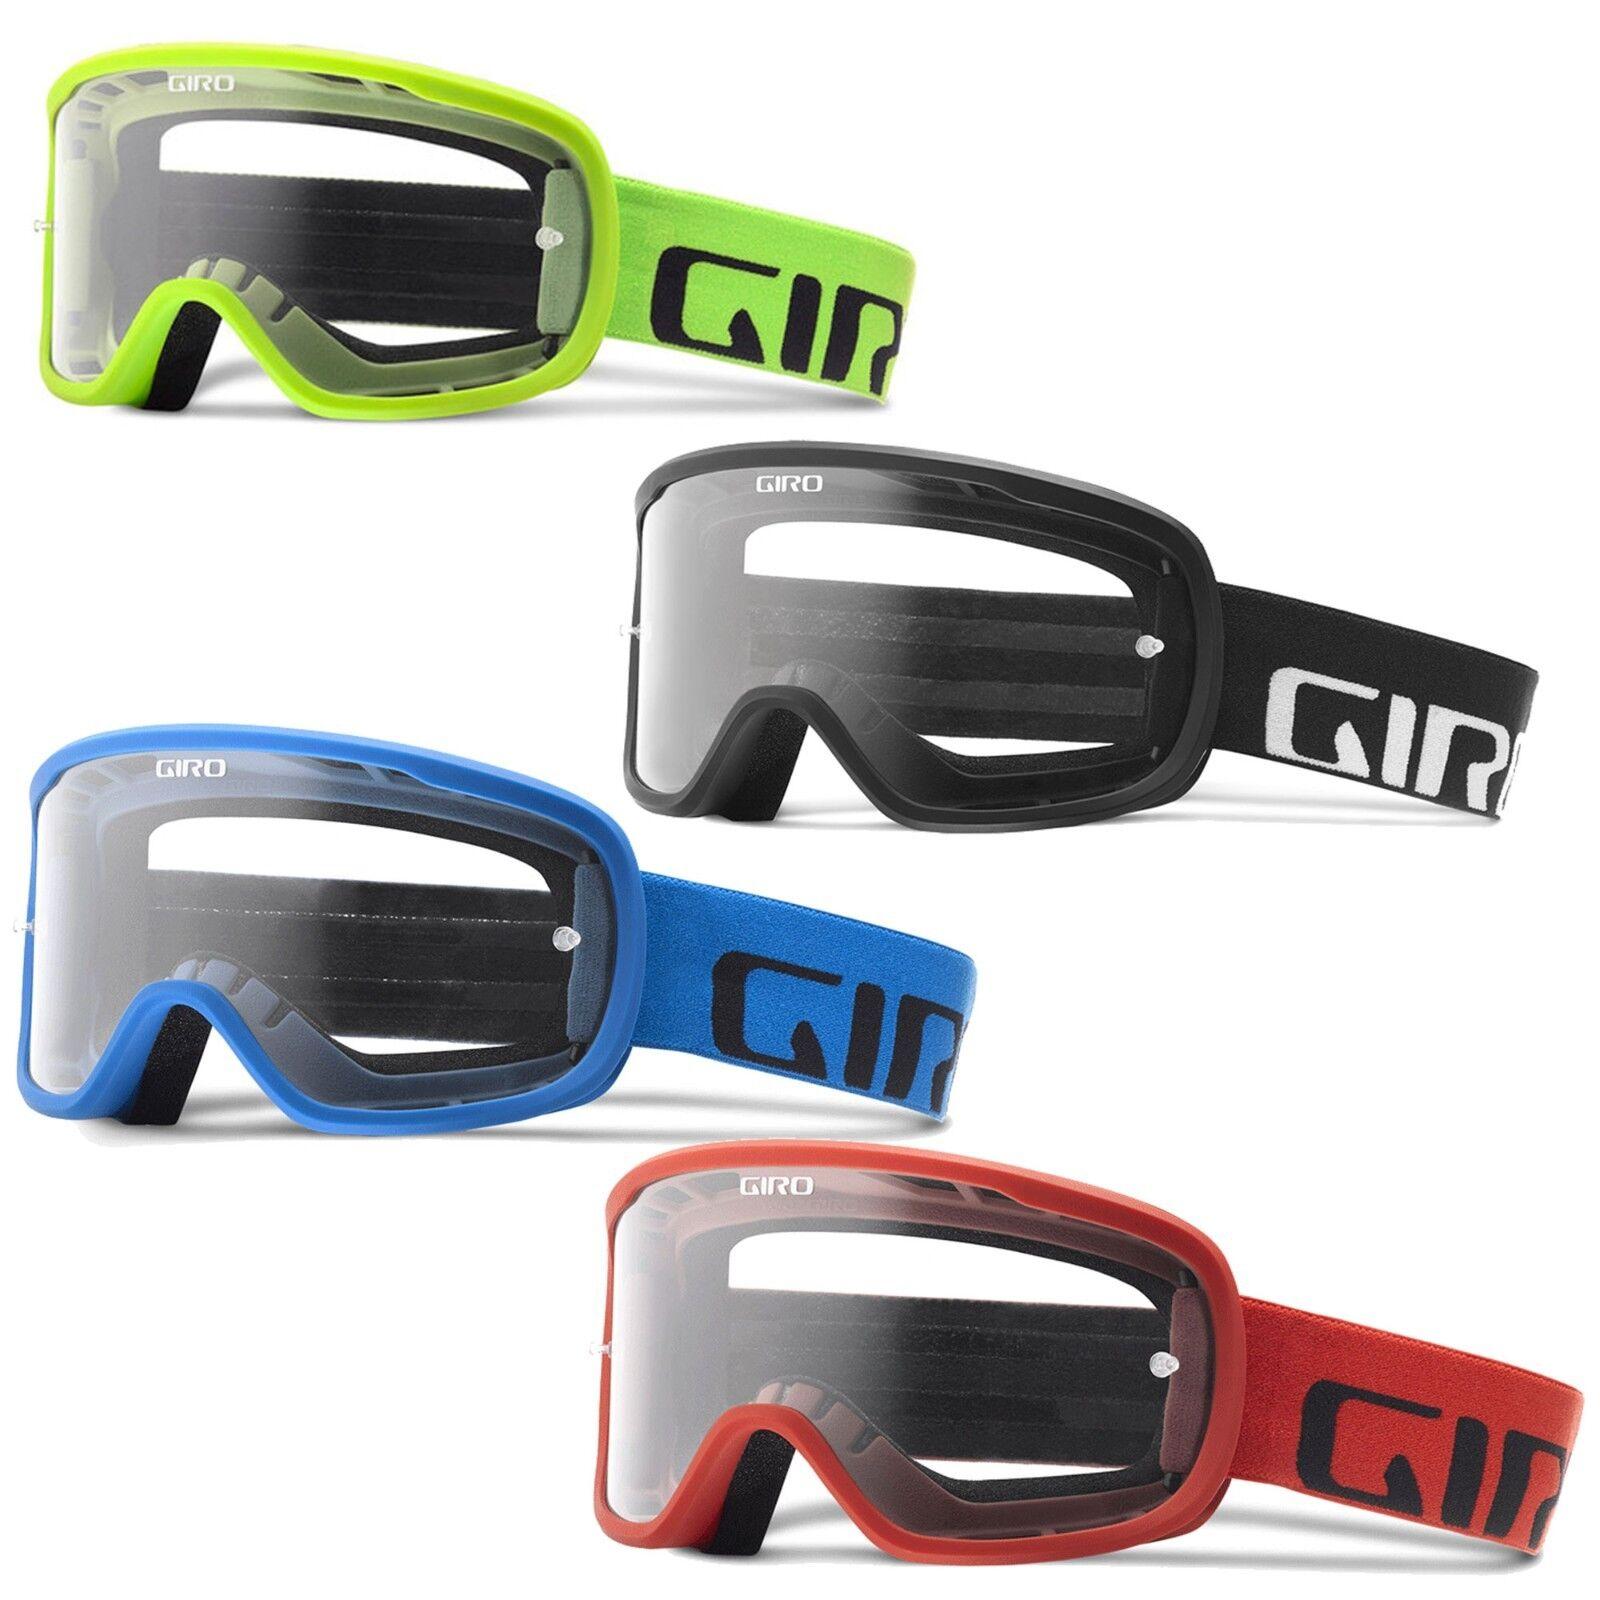 Giro Tempo MTB Goggles Clear Lens Mountain Bike Eyewear